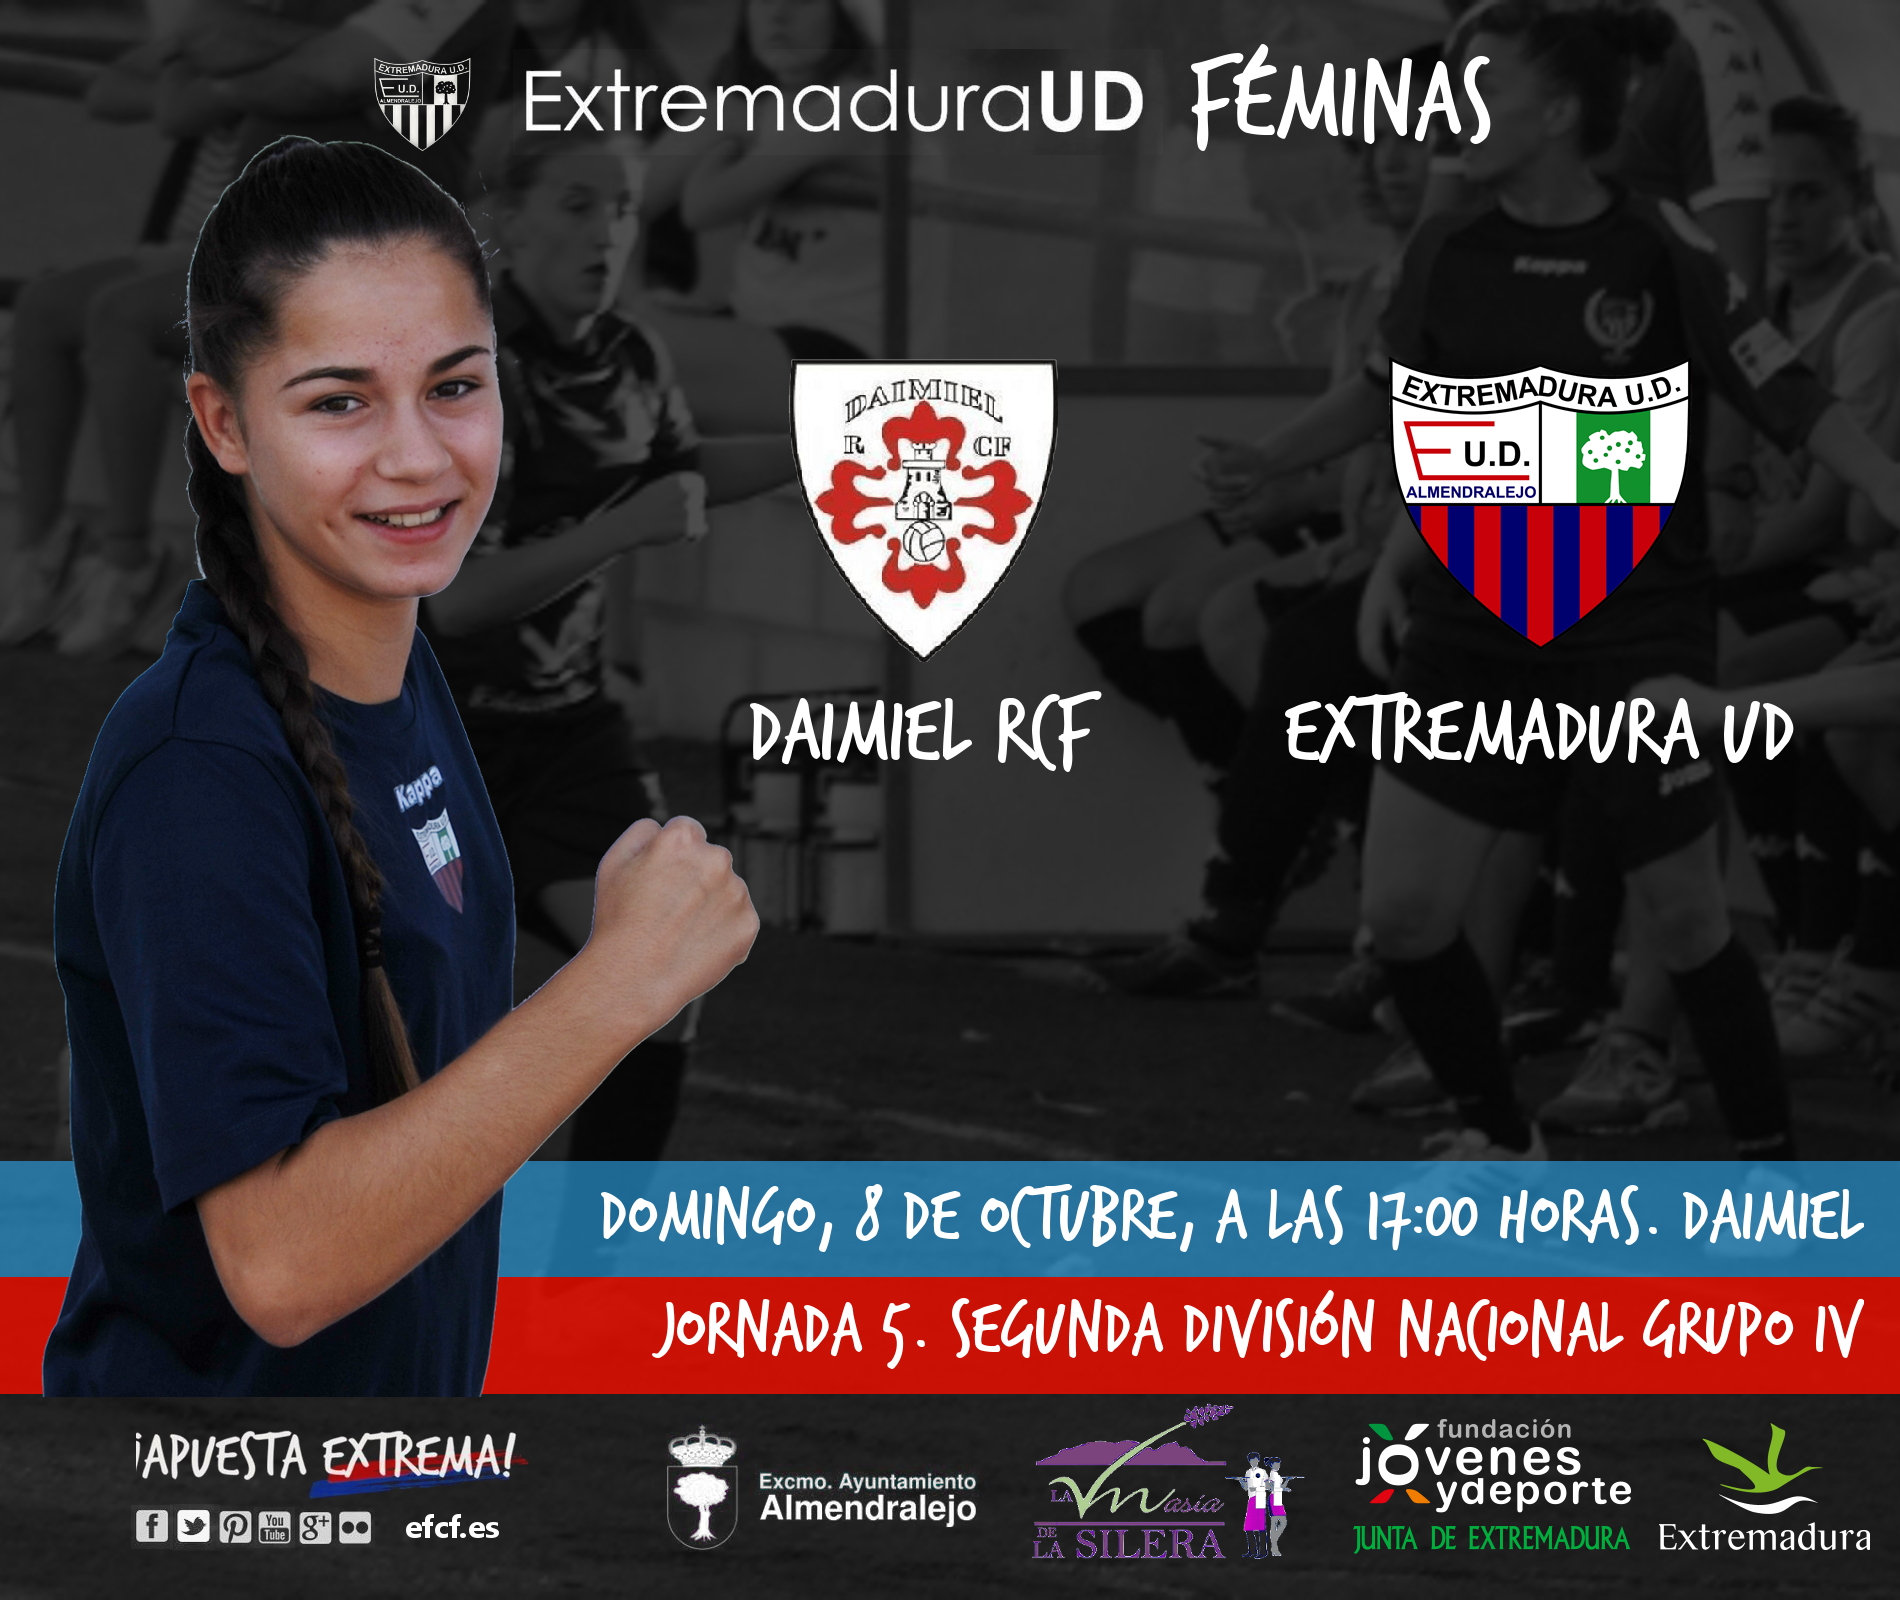 SEGUNDA DIVISIÓN Grupo IV | Jornada 5 Daimiel RCF v Extremadura UD ...